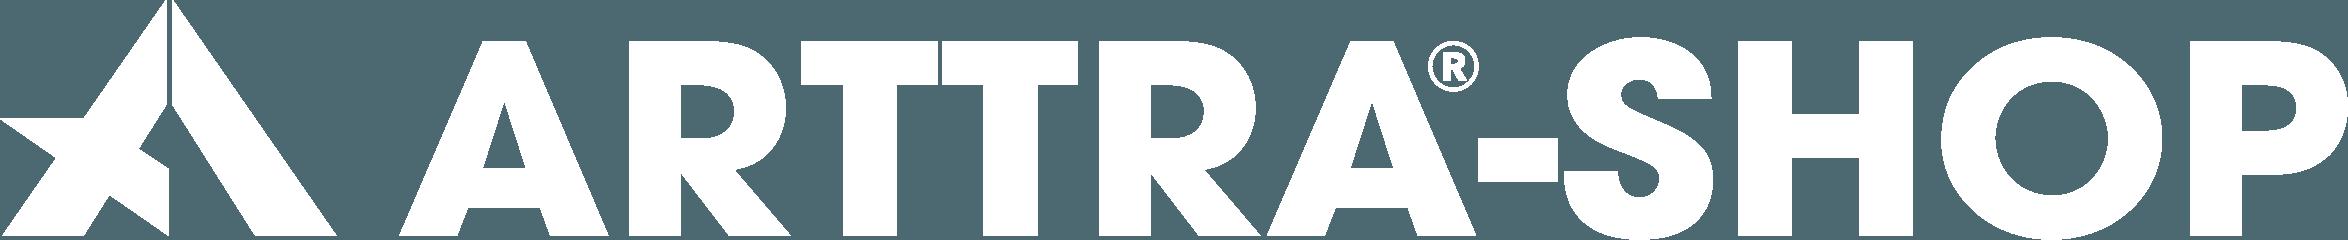 ARTTRA-SHOP